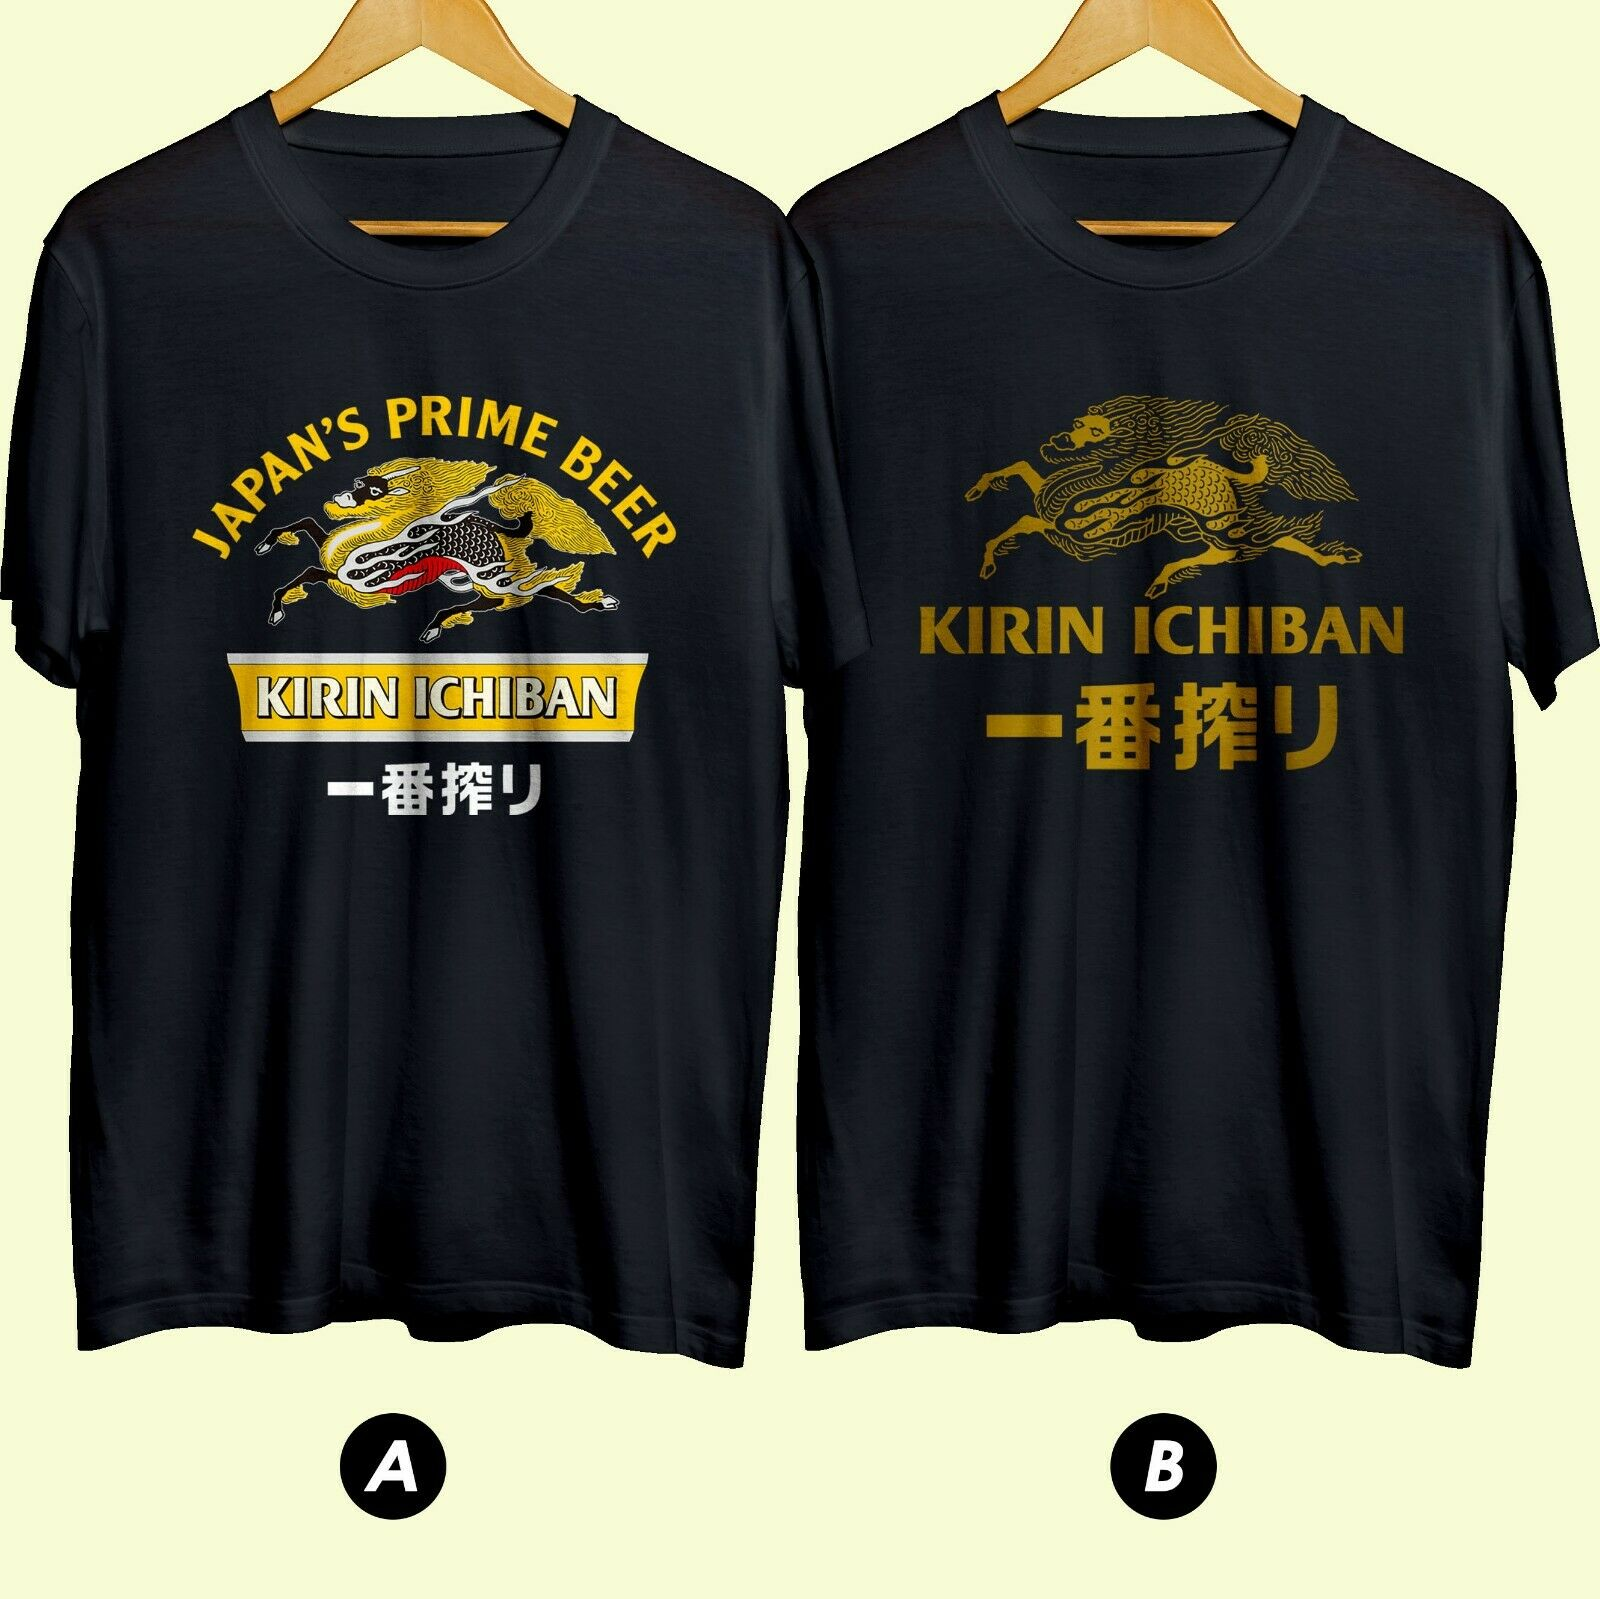 Kirin Ichiban, японская футболка с надписью «Beer Brawery», 100% хлопок, Новинка